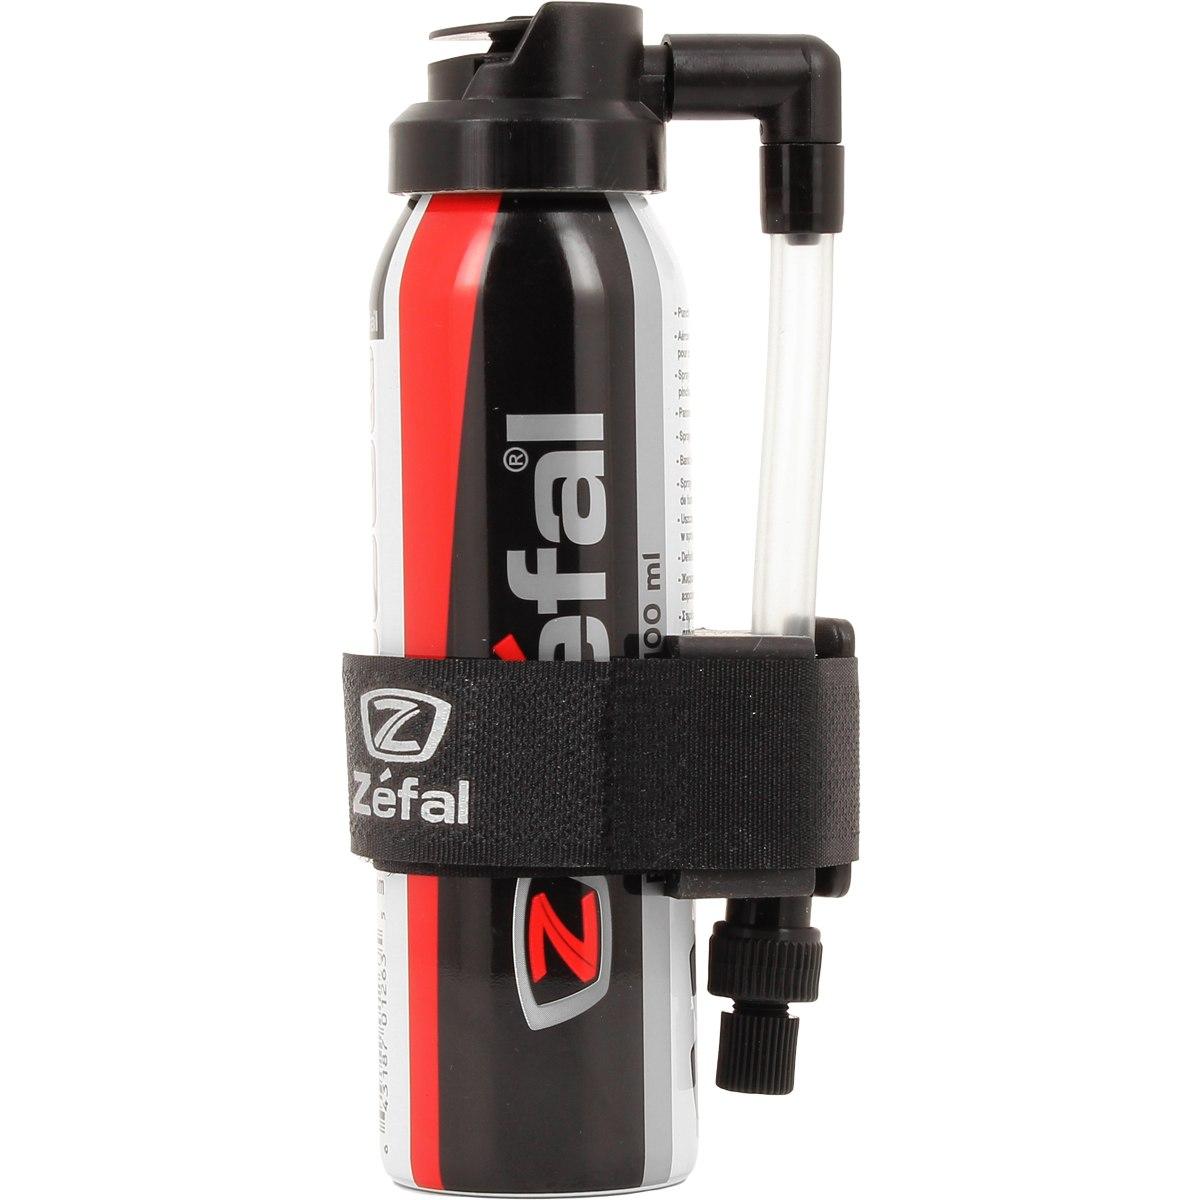 Zéfal Repair Spray Pannenspray 100ml + Doobad Halterung